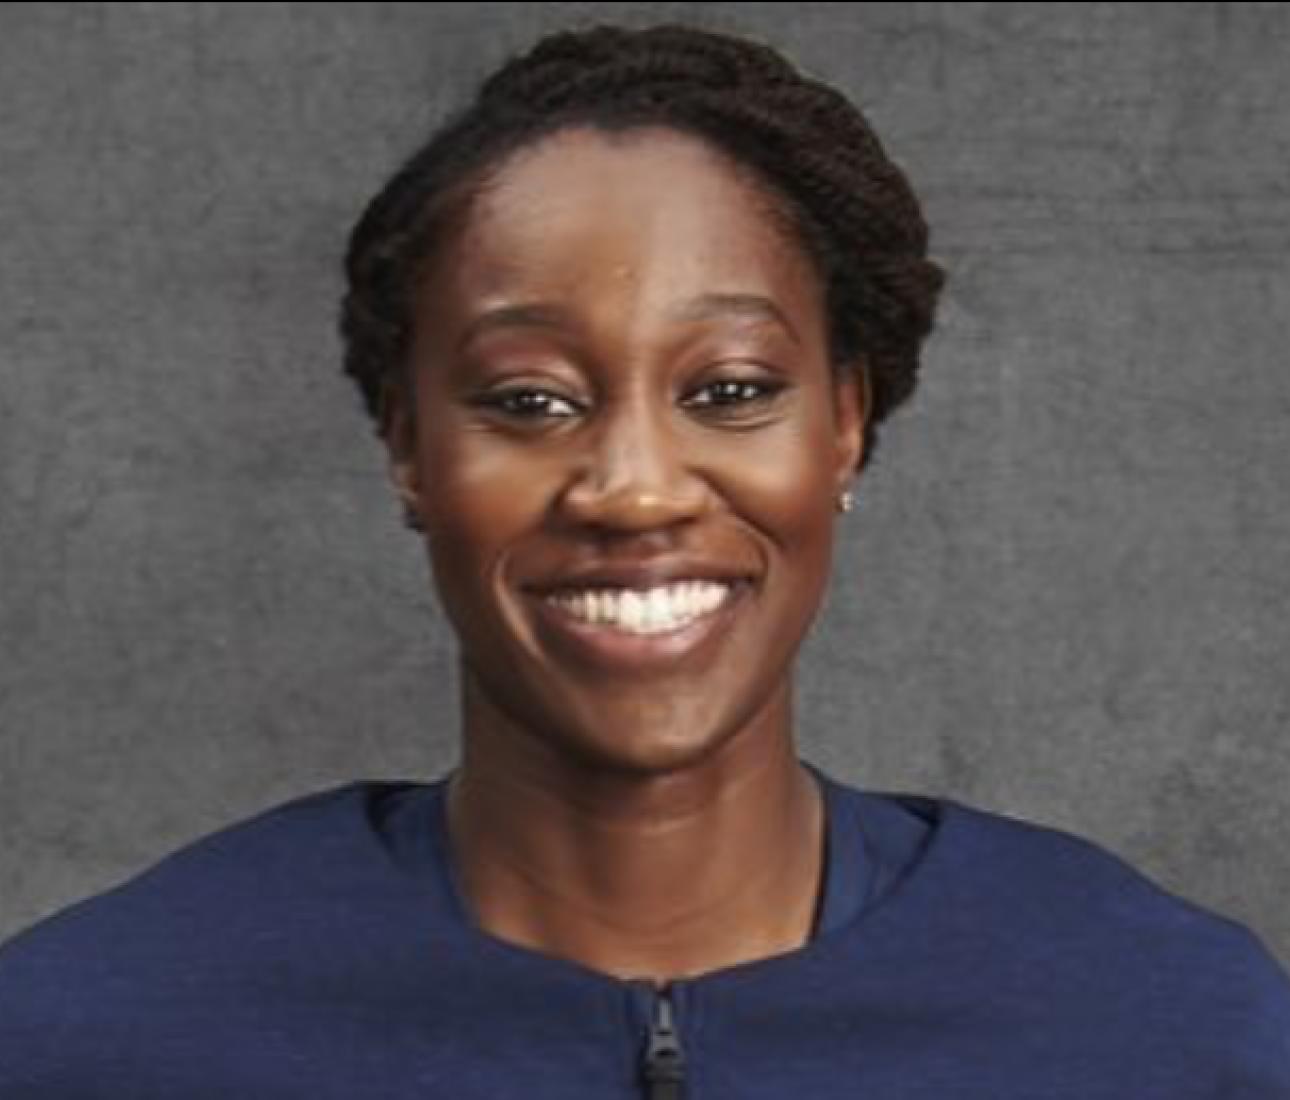 Basketball & Activism: A Conversation with Tina Charles